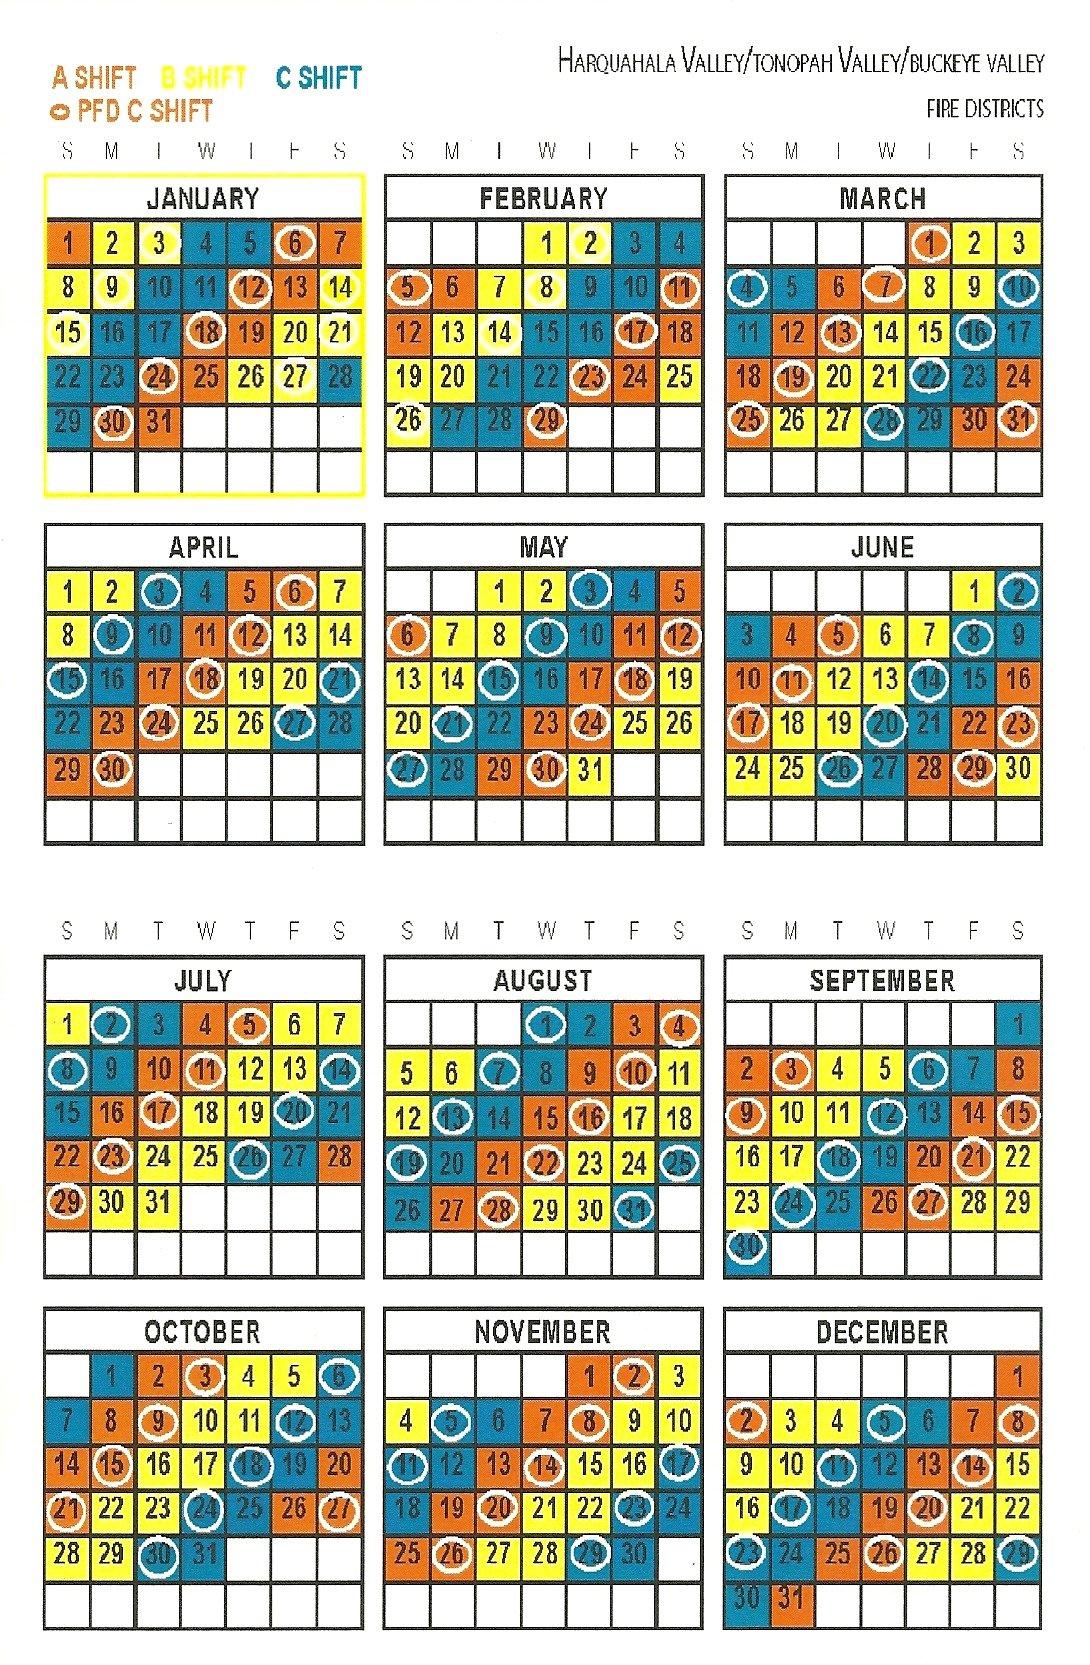 Firefighter Shift Schedule Tool :-Free Calendar Template intended for Free Shift Calendar